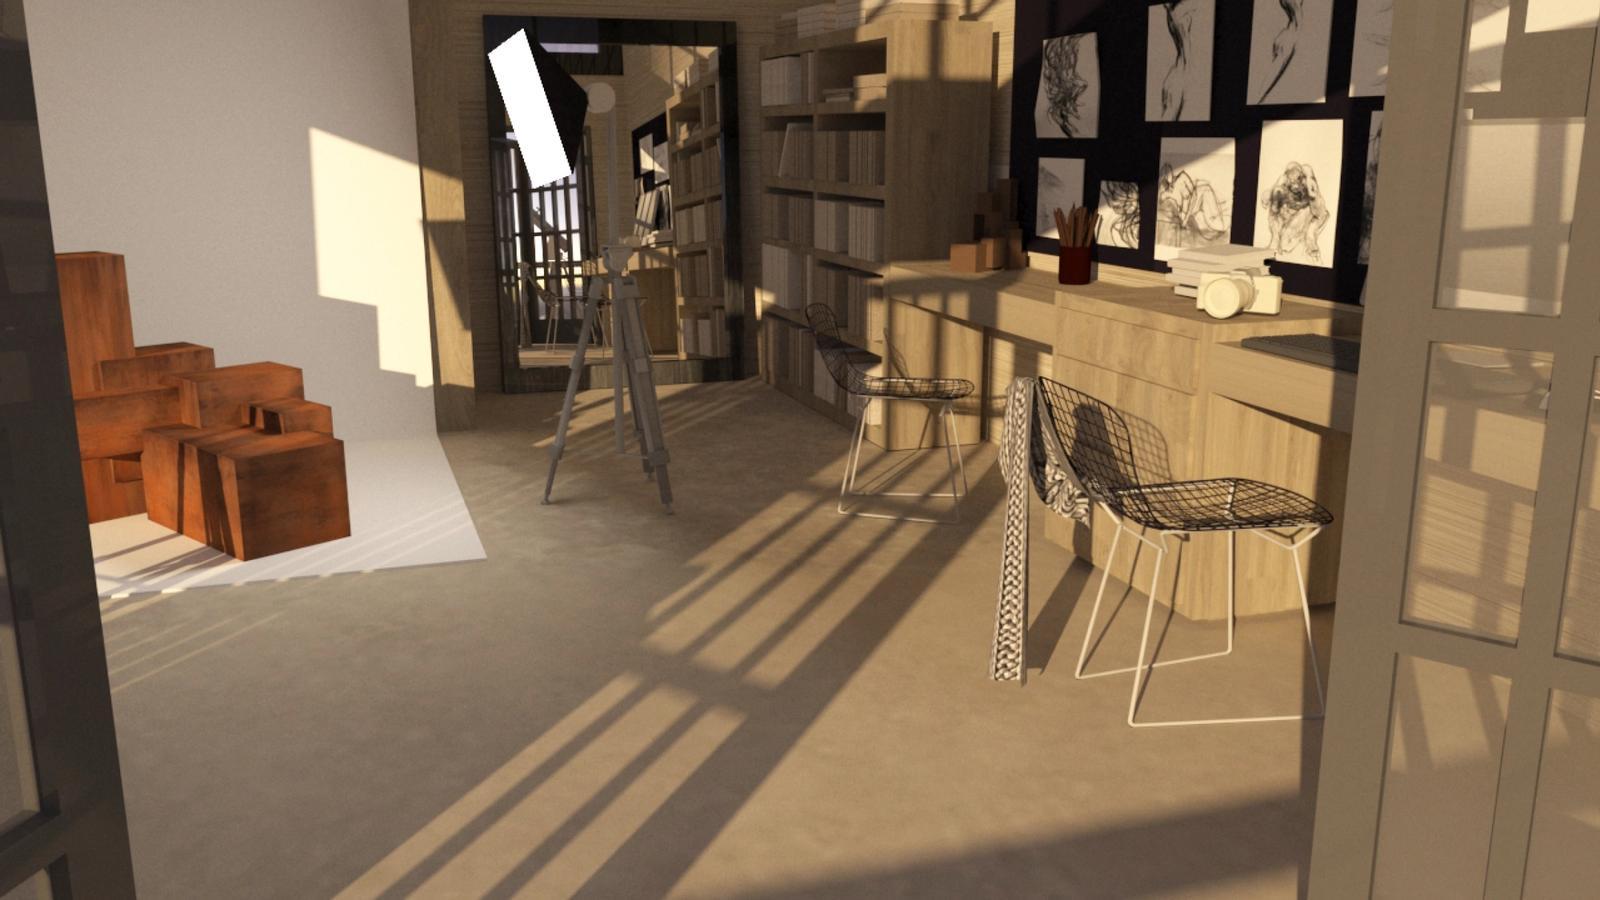 Artist Studio Loft - Studio in the Late Afternoon